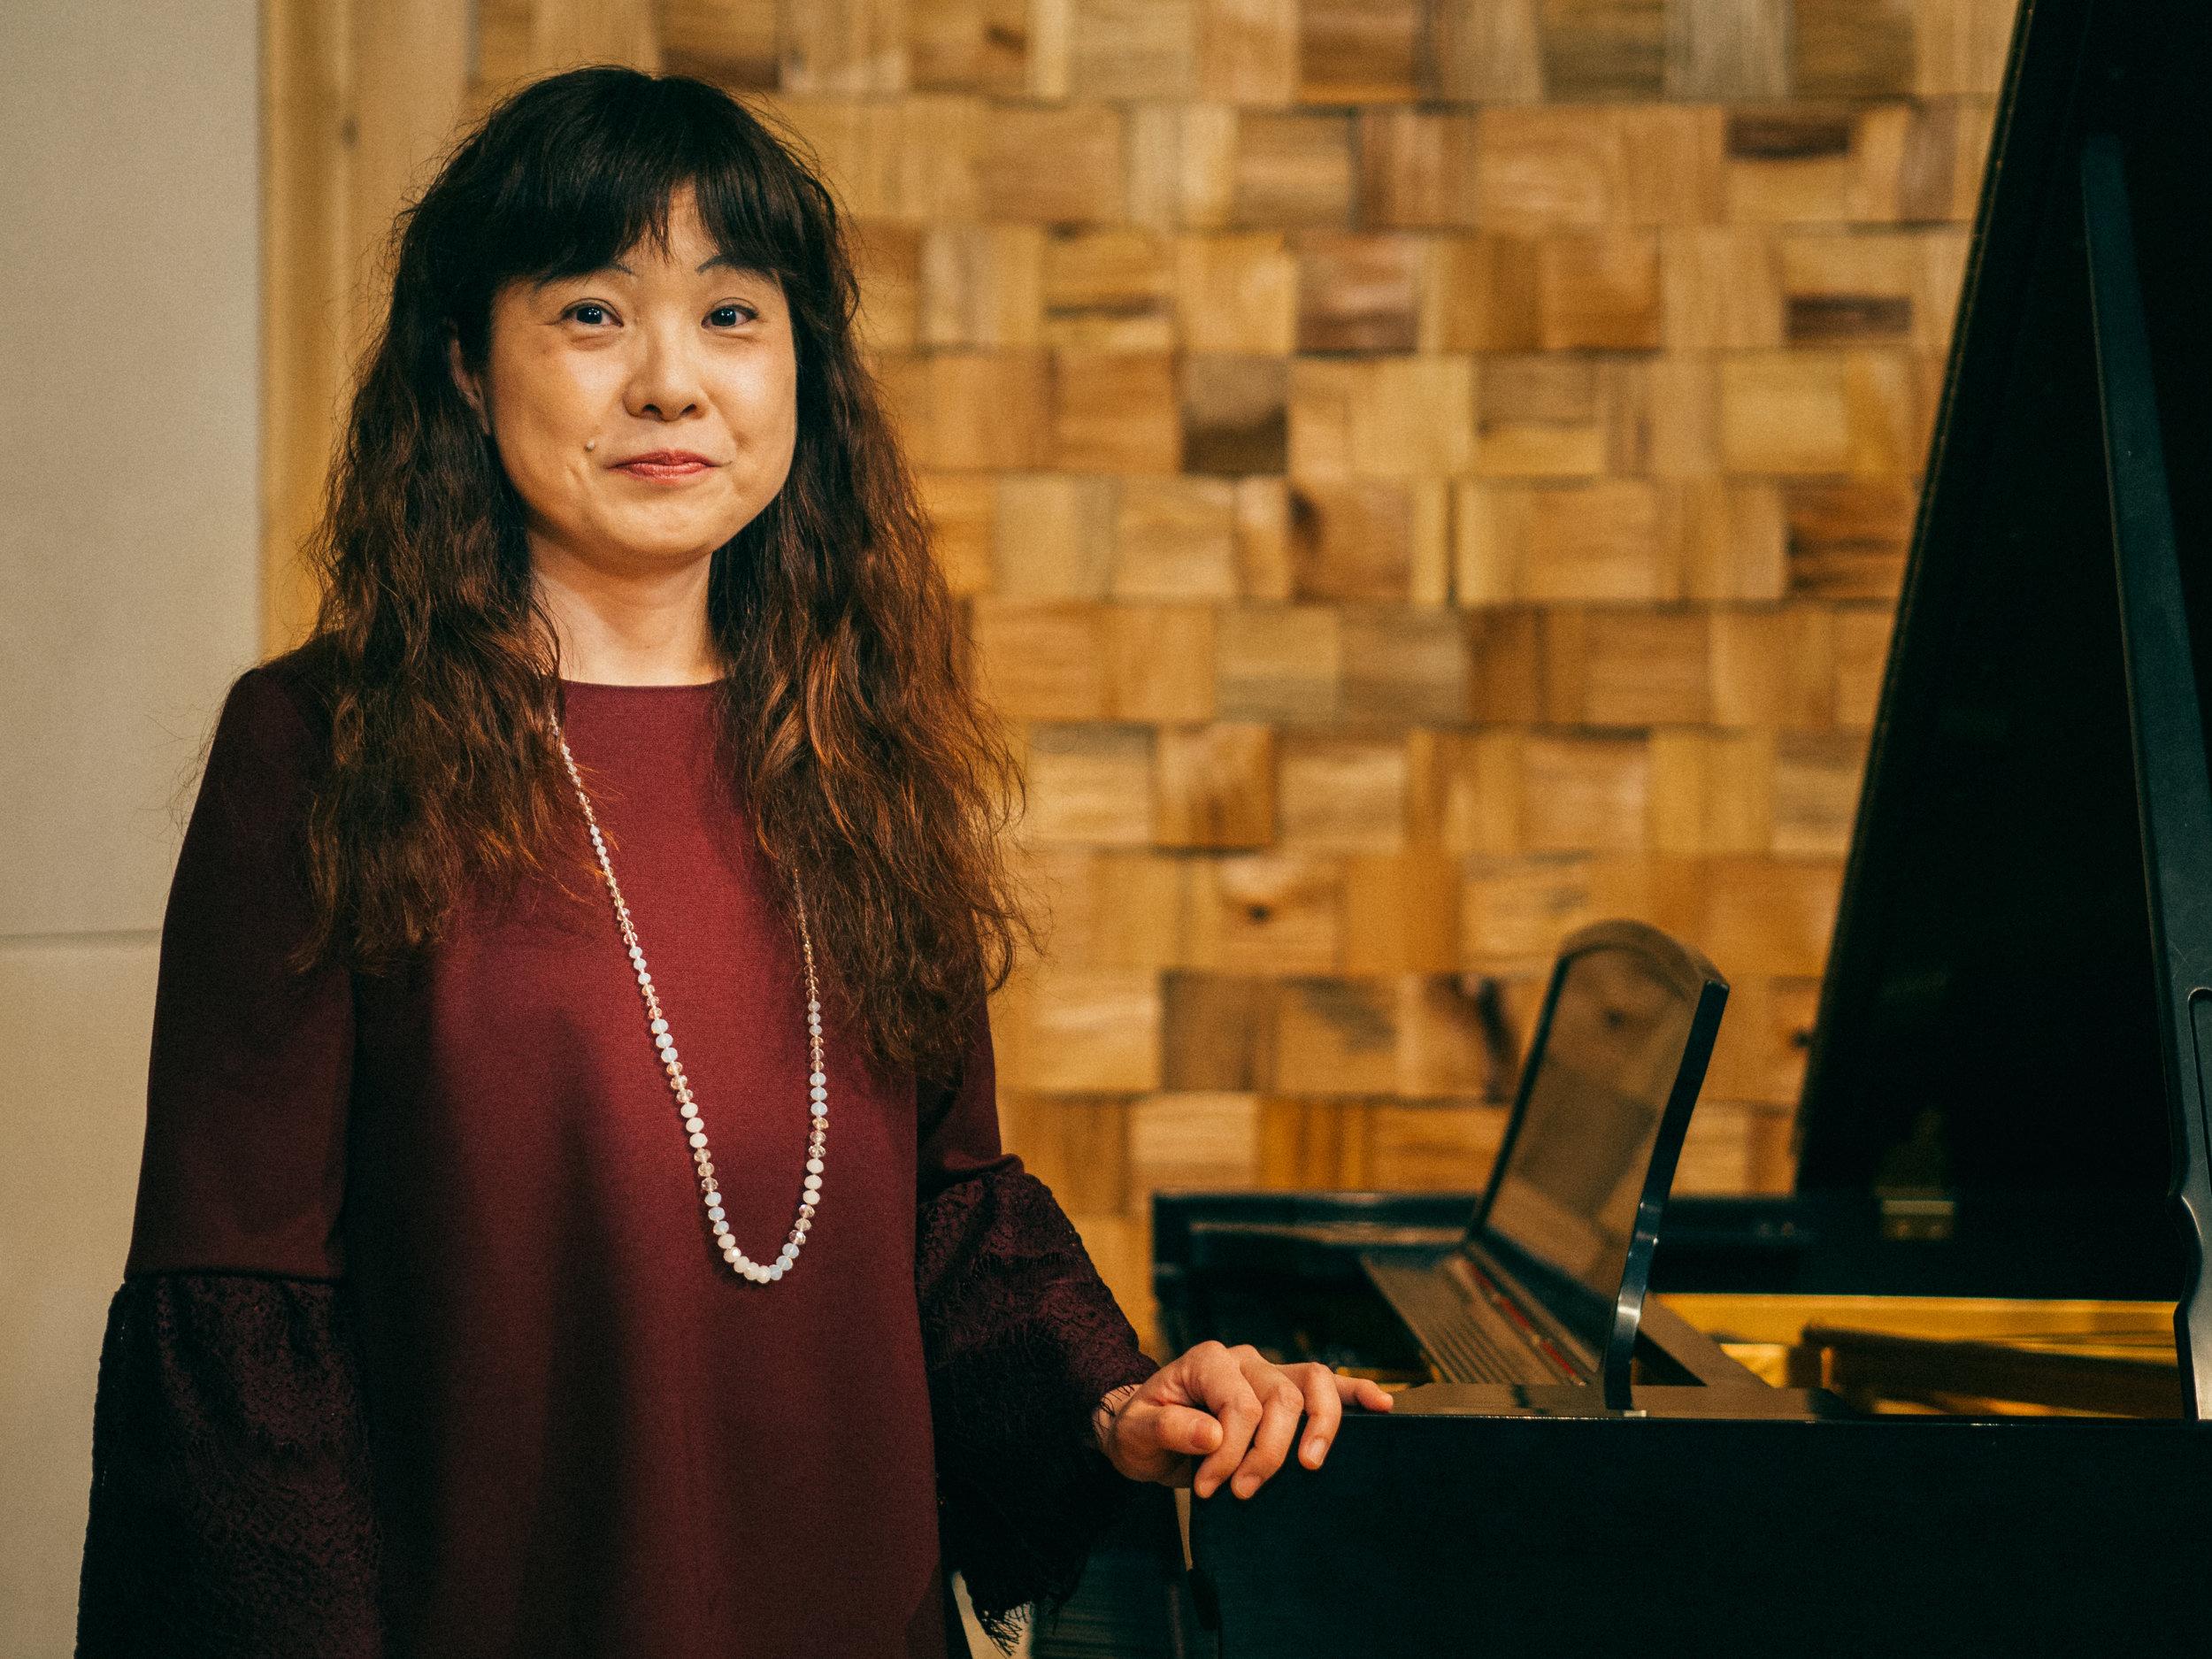 Composer Saori Kobayashi